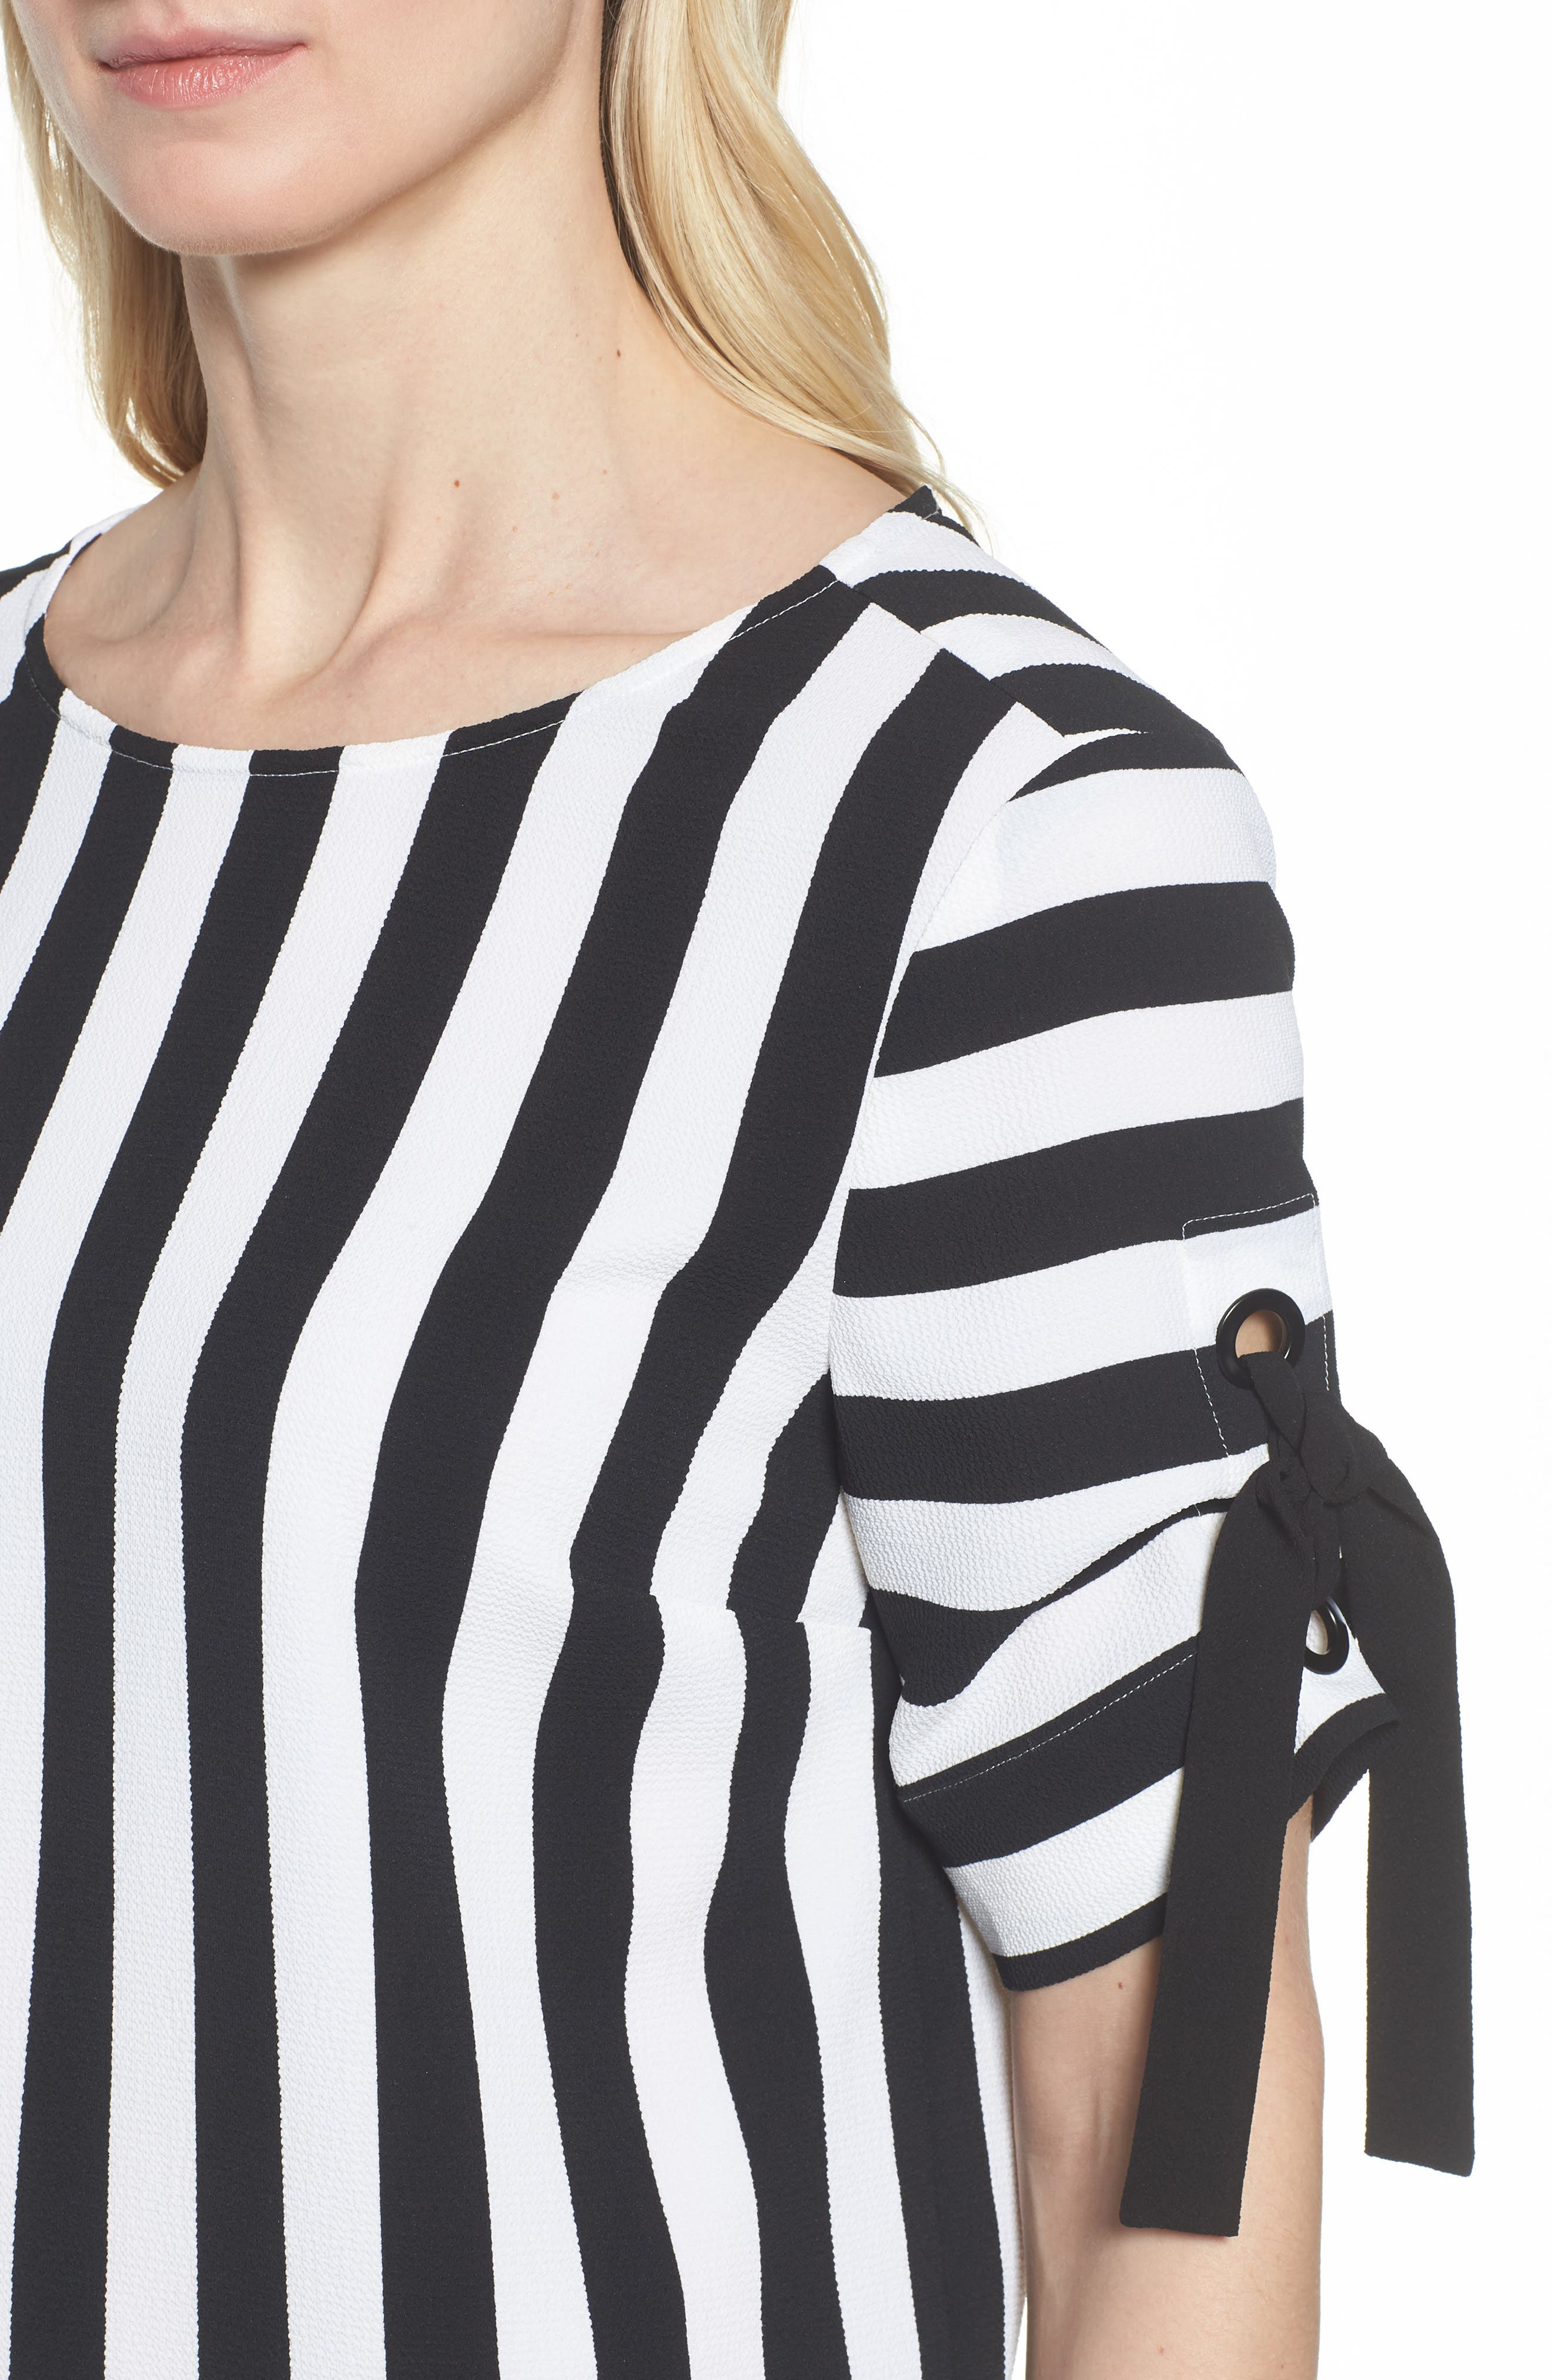 Spectator Stripe Tie Cuff Blouse,                             Alternate thumbnail 6, color,                             Rich Black